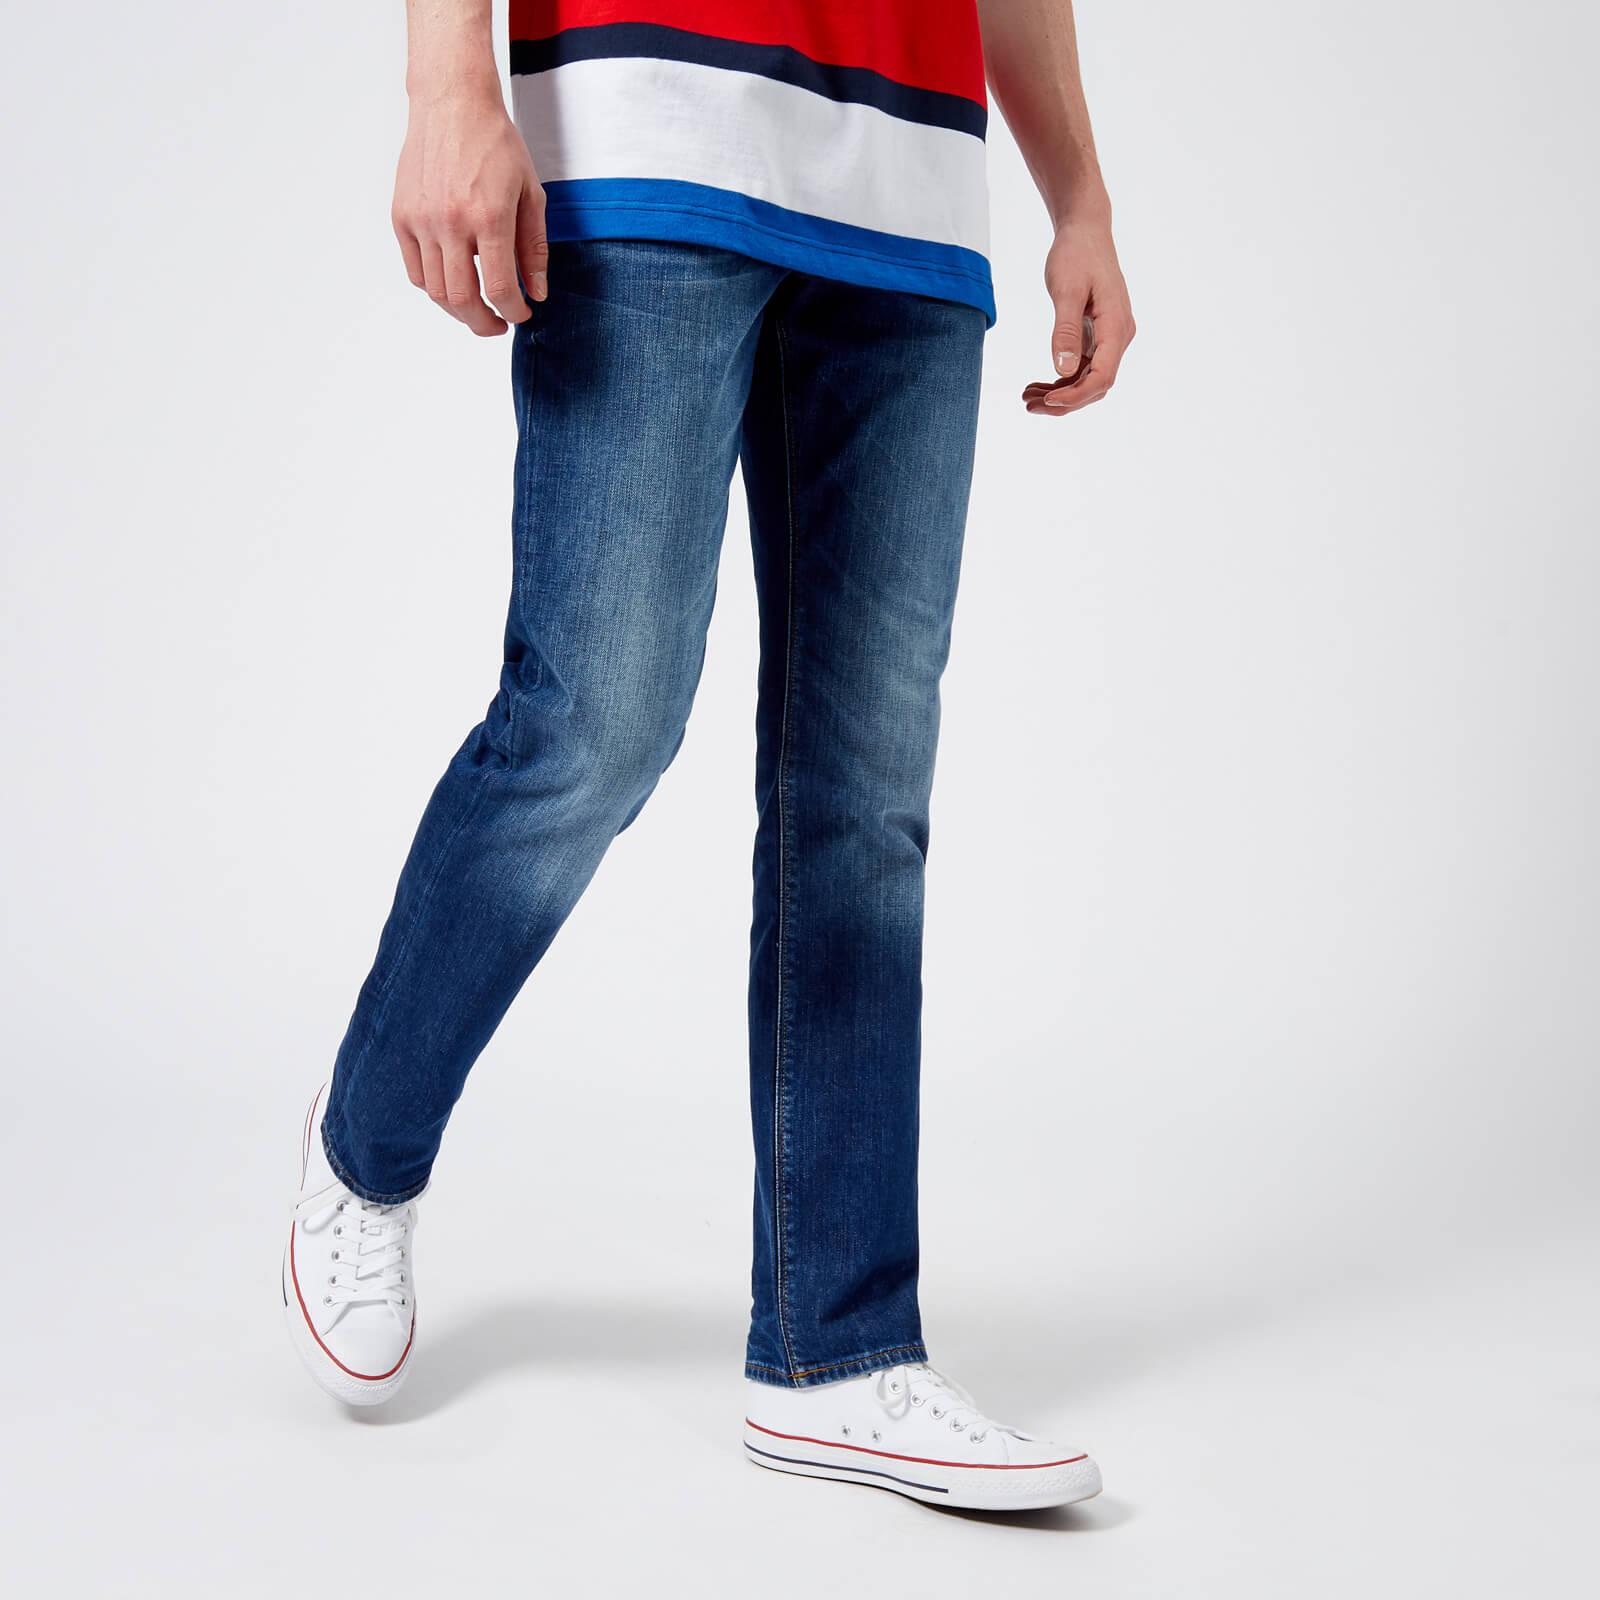 3557ae8b Tommy Hilfiger Men's Core Denton Straight Jeans - Denim Blue Mens Clothing  | TheHut.com